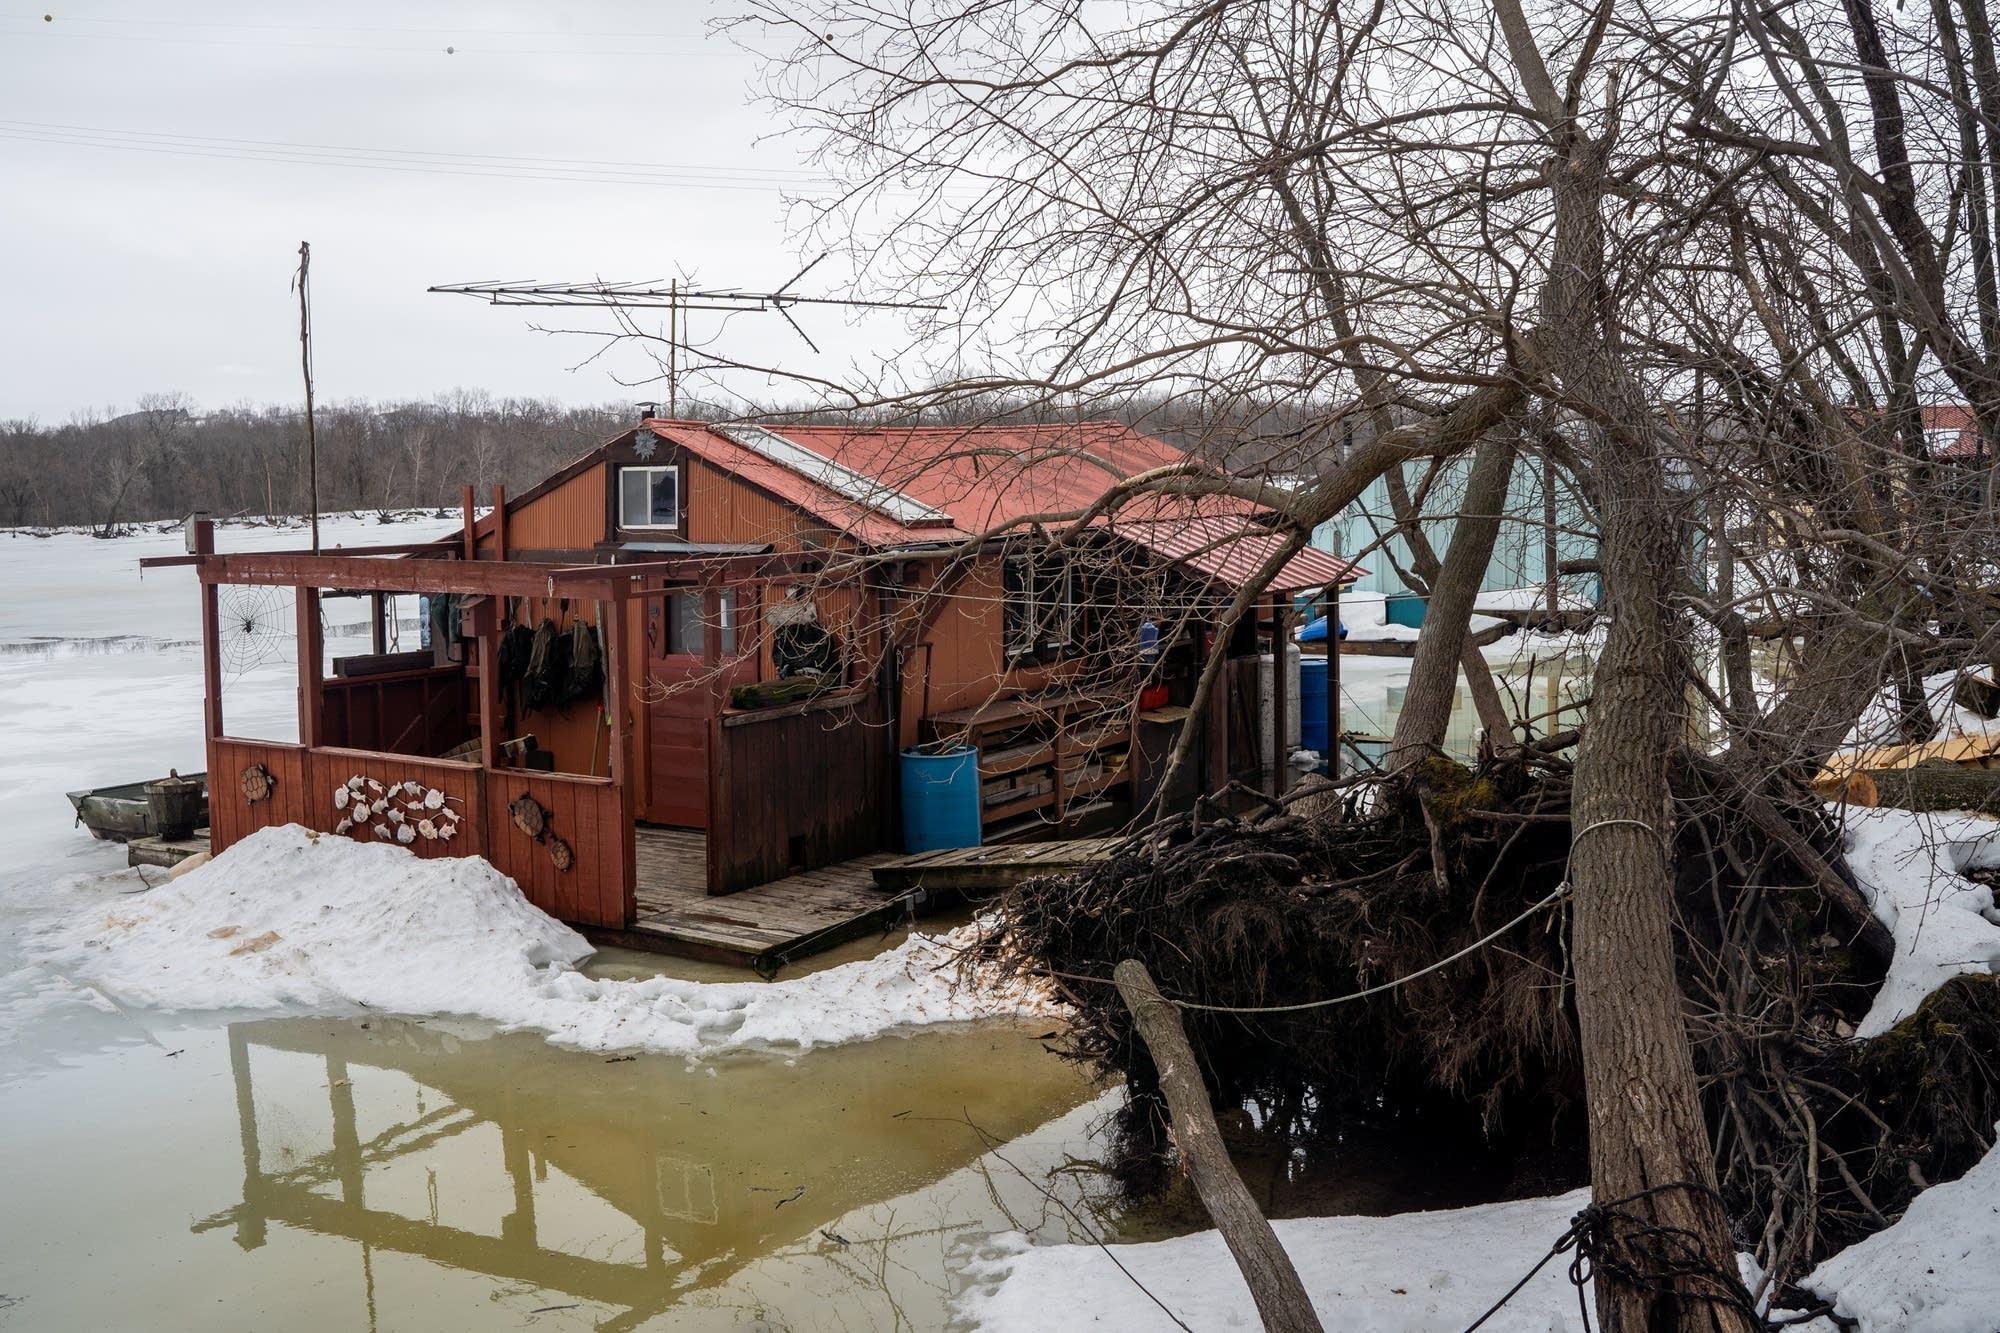 Ice and snow encase John Rupkey's home on Latsch Island.